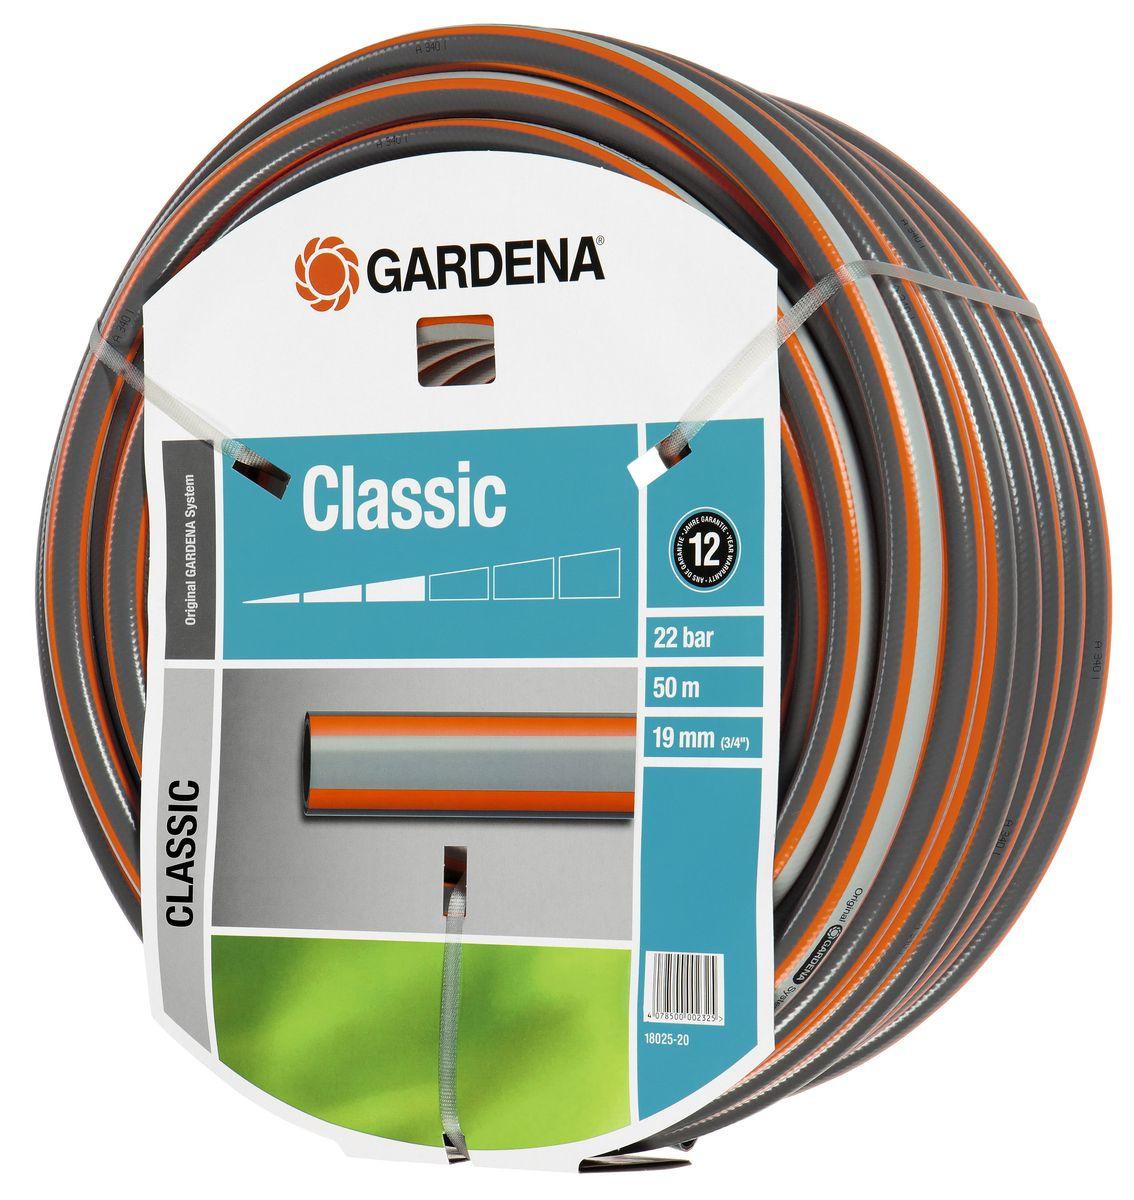 Шланг Gardena Classic, 19 мм (3/4) х 50 м шланг raco classic 3 4x25m 40306 3 4 25